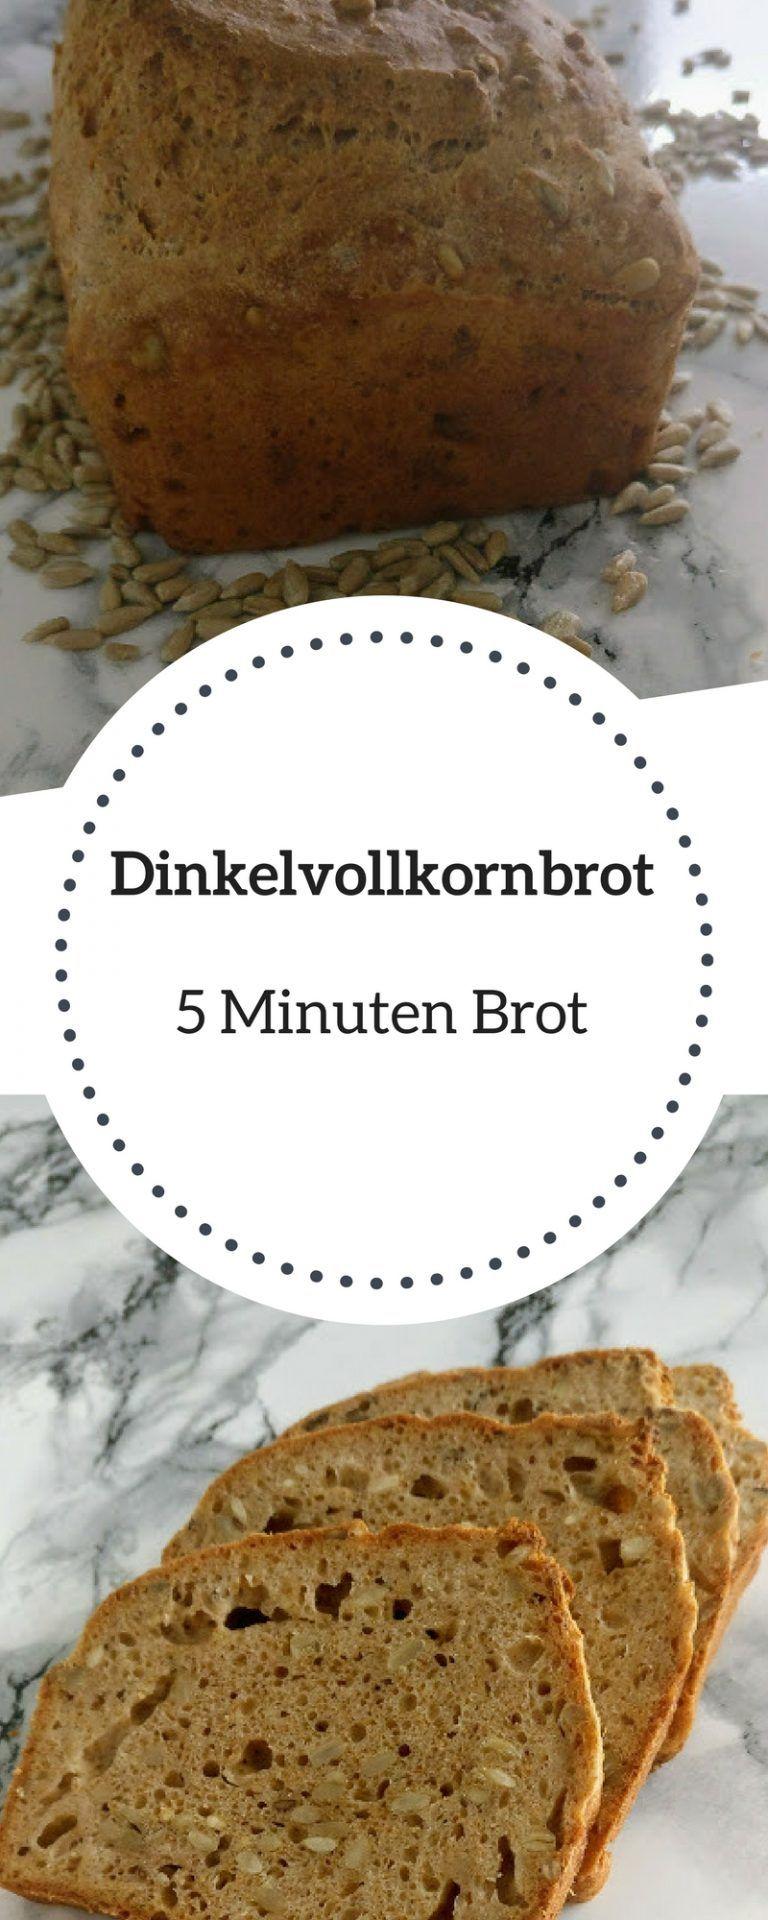 Dinkelvollkornbrot - Das schnelle 5 Minuten Brot | Rezept ...